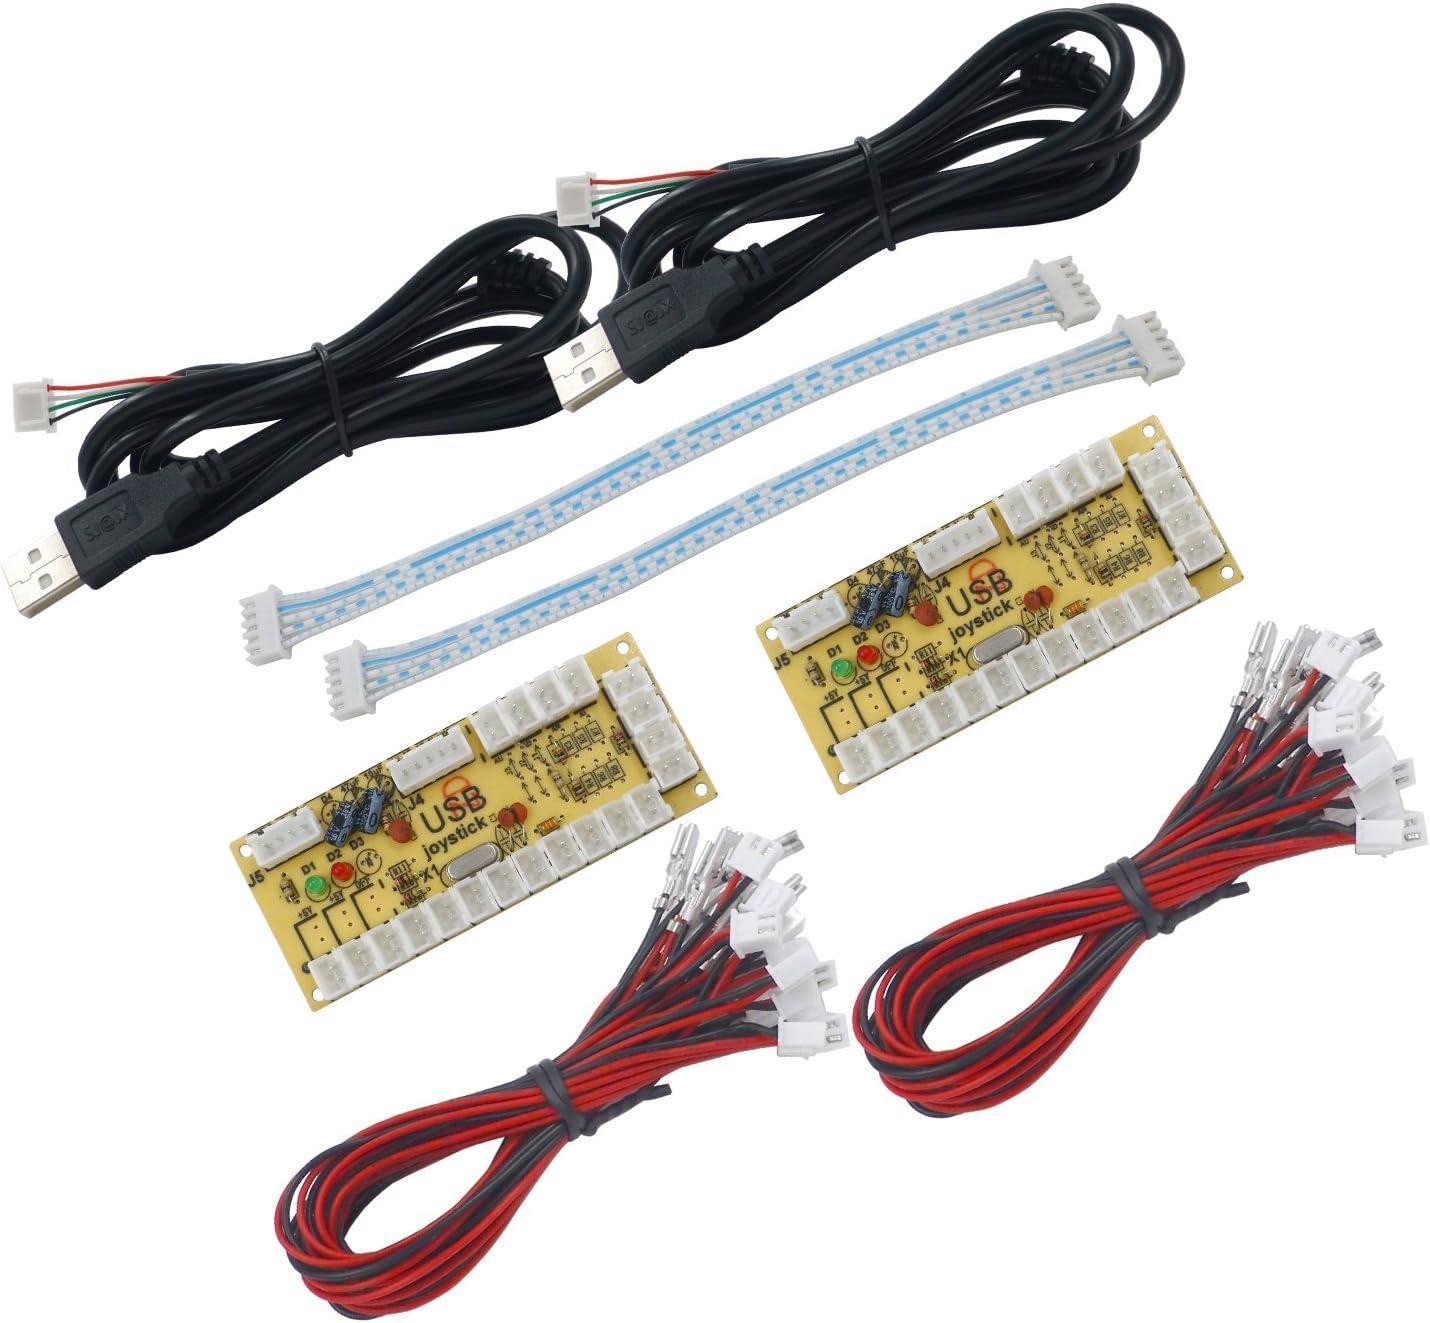 SJ@JX Arcade Game Controller USB Encoder Zero Delay 2 Player to Joystick Button for PC MAME RaspberryPi Retro: Computers & Accessories